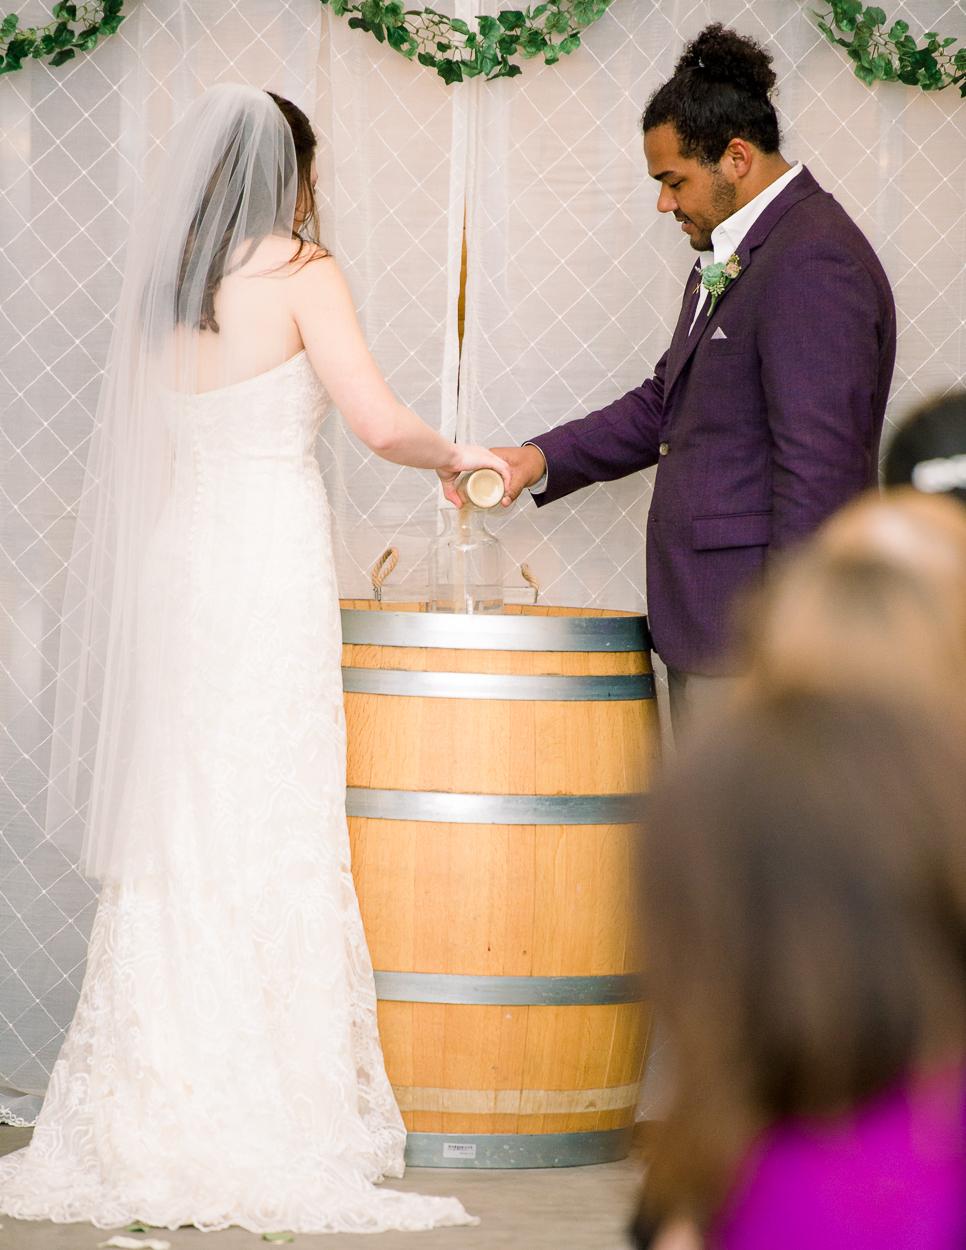 BigCork_vineyard wedding_virginiaweddingphotographer_youseephotography_SarahJames (83).JPG